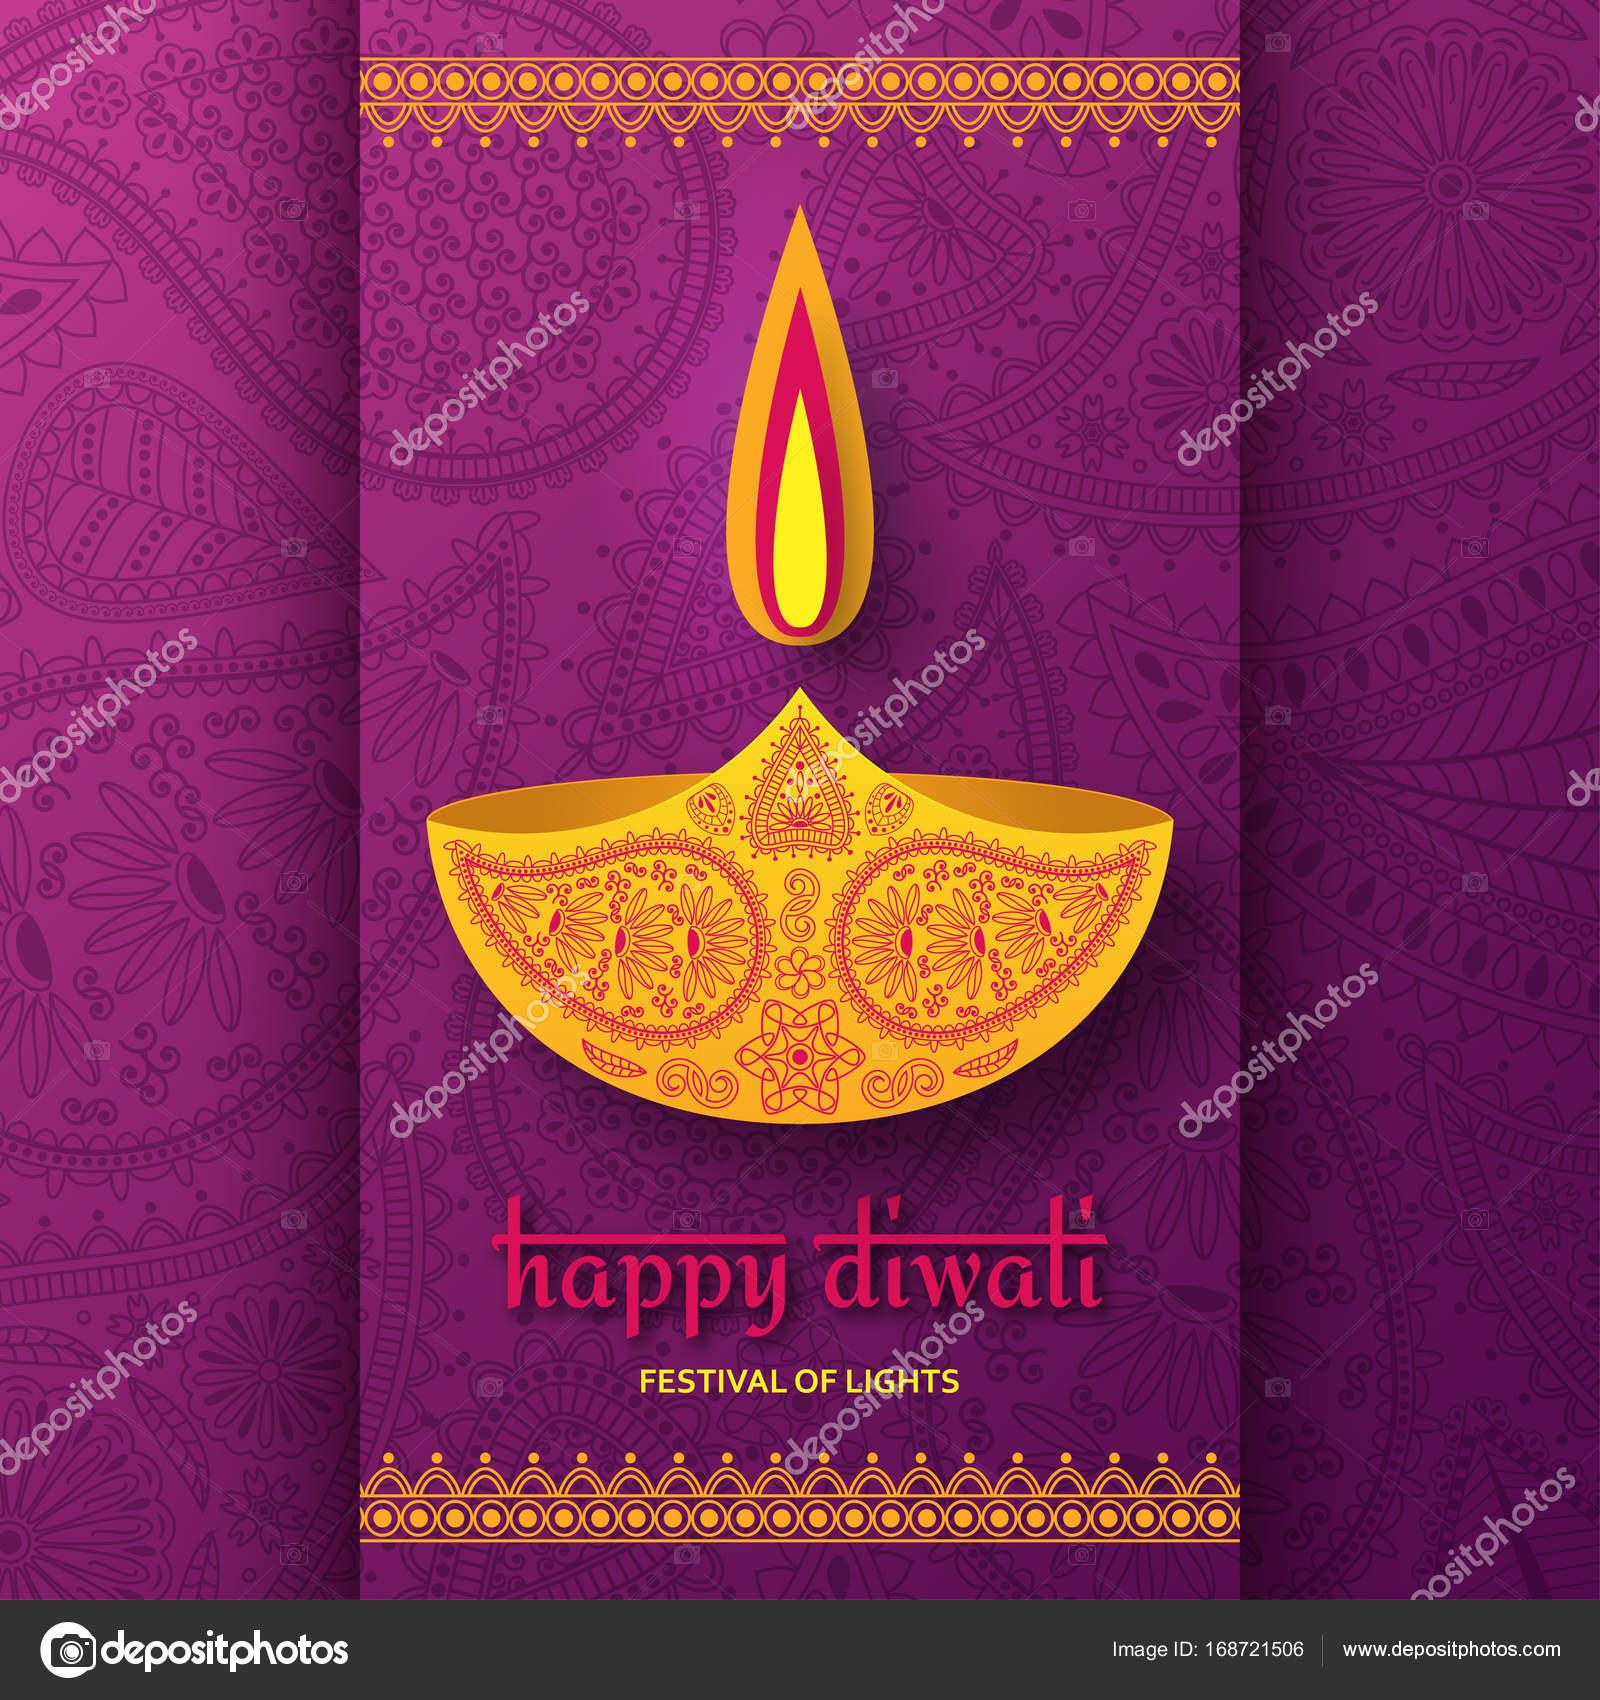 Greeting Card For Diwali Festival Celebration In India Stock